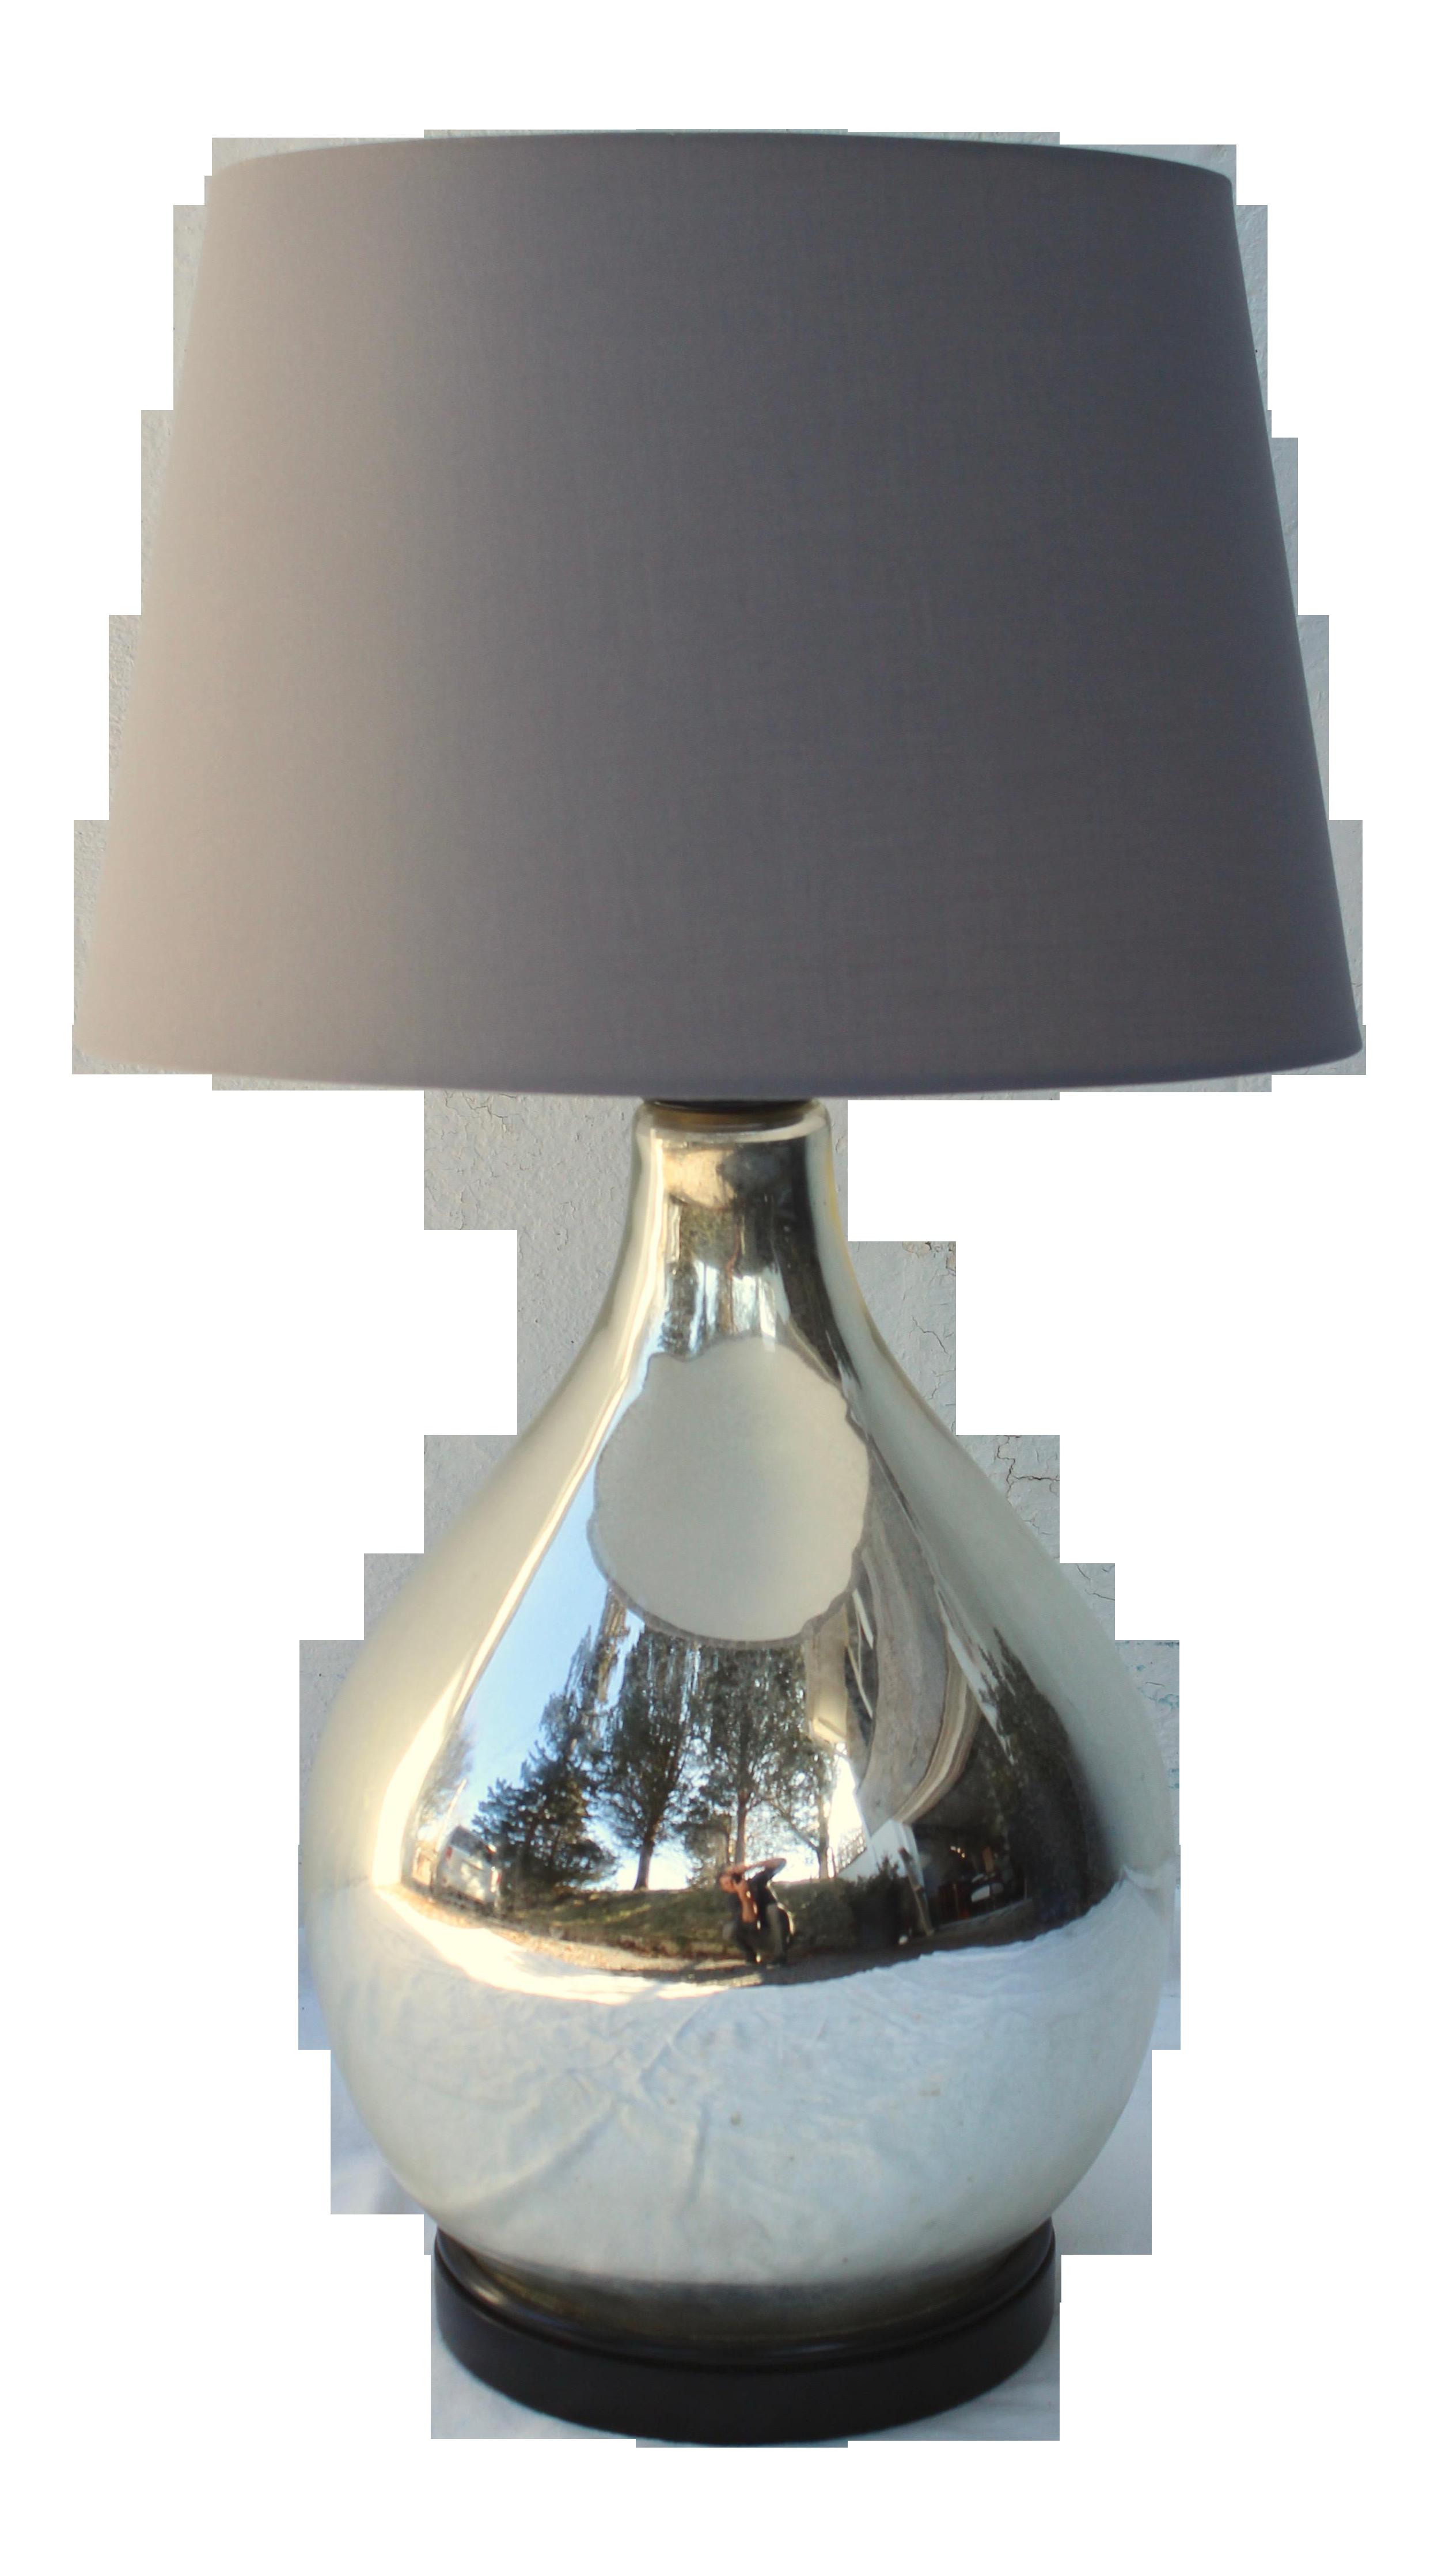 Image of: Large Vintage Mercury Glass Table Lamp Chairish